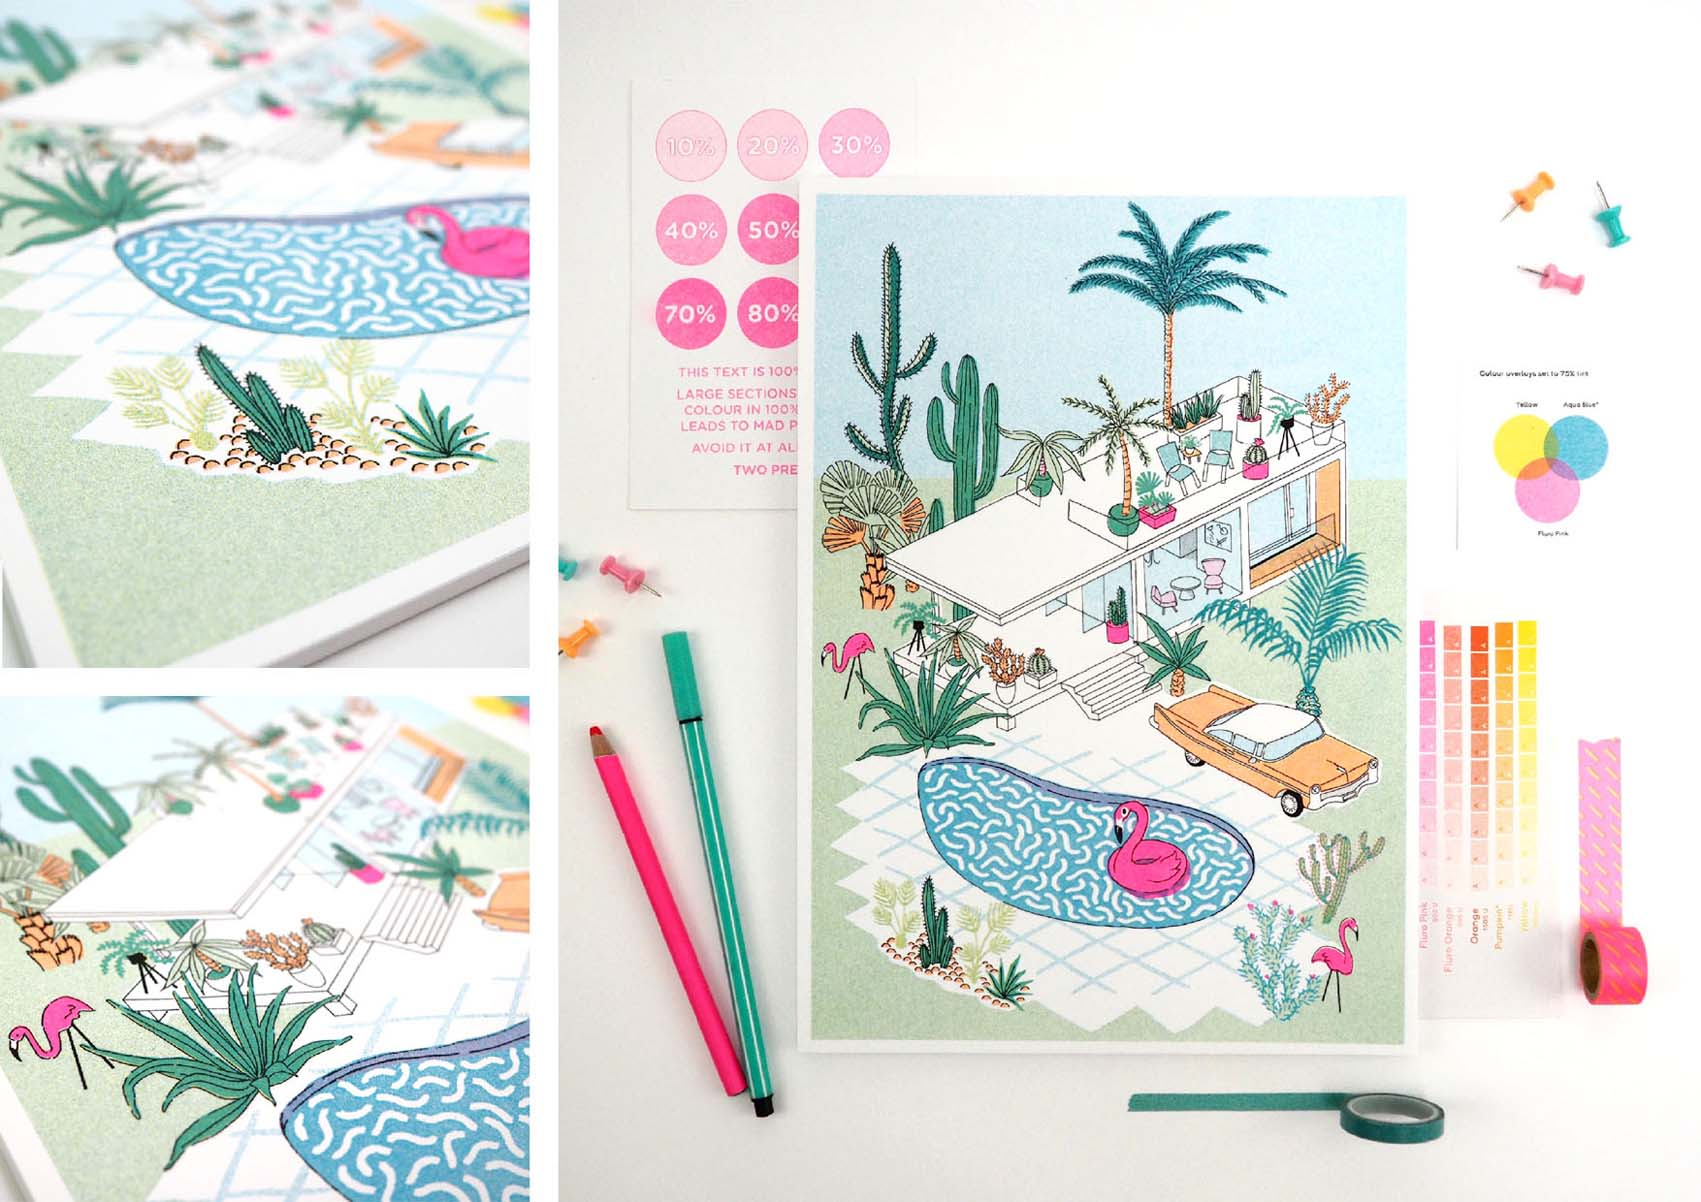 Palm-Springs-Screen-Print-Riso-sm.jpg